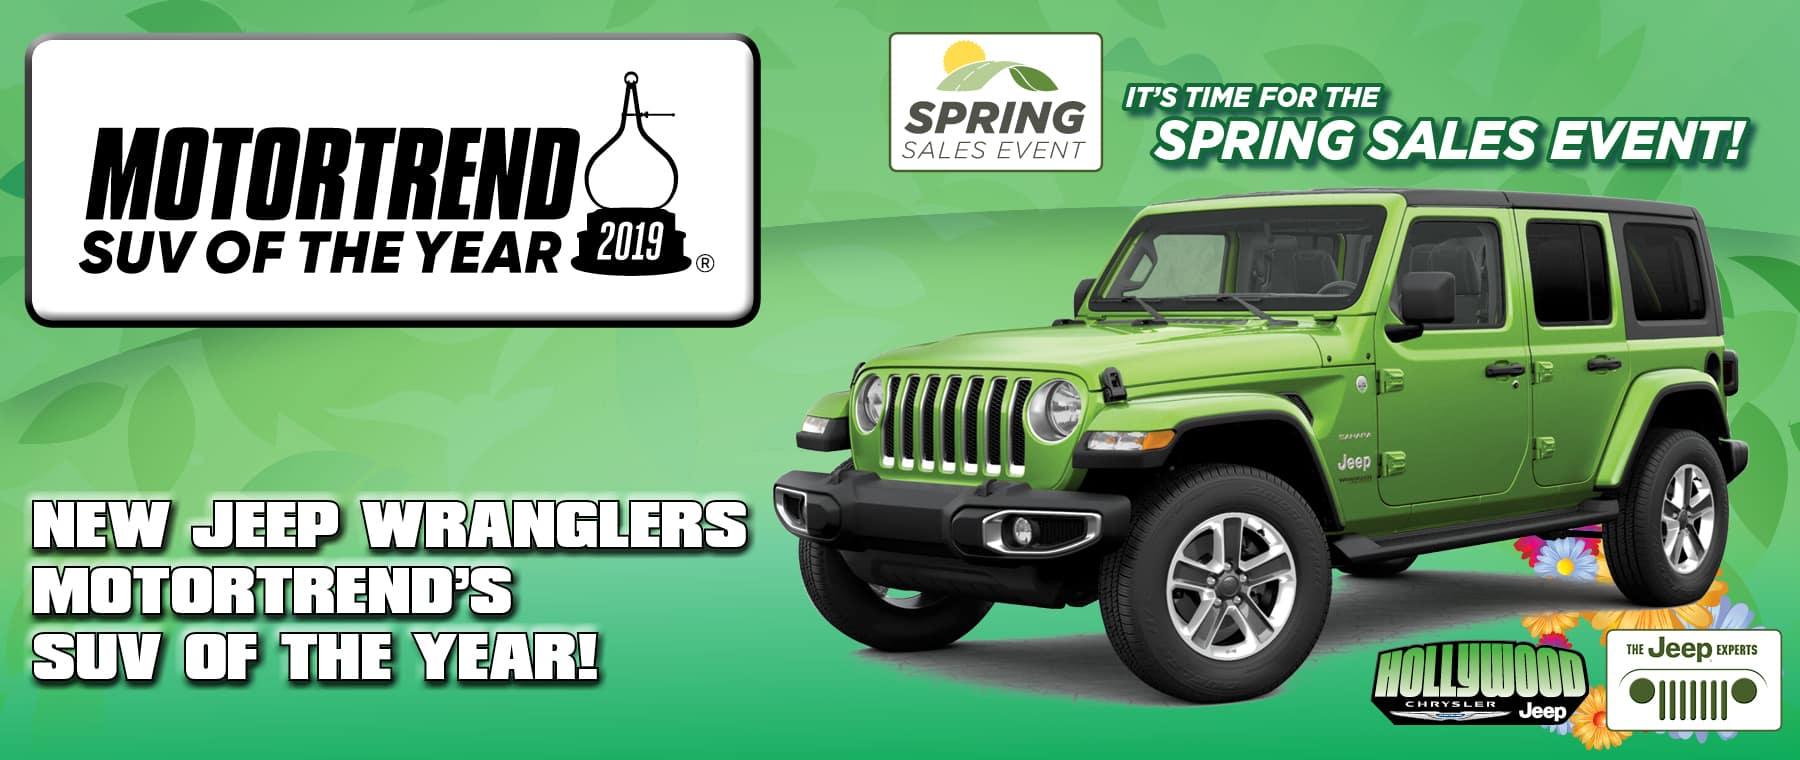 Wrangler Motor Trend SUV of the Year